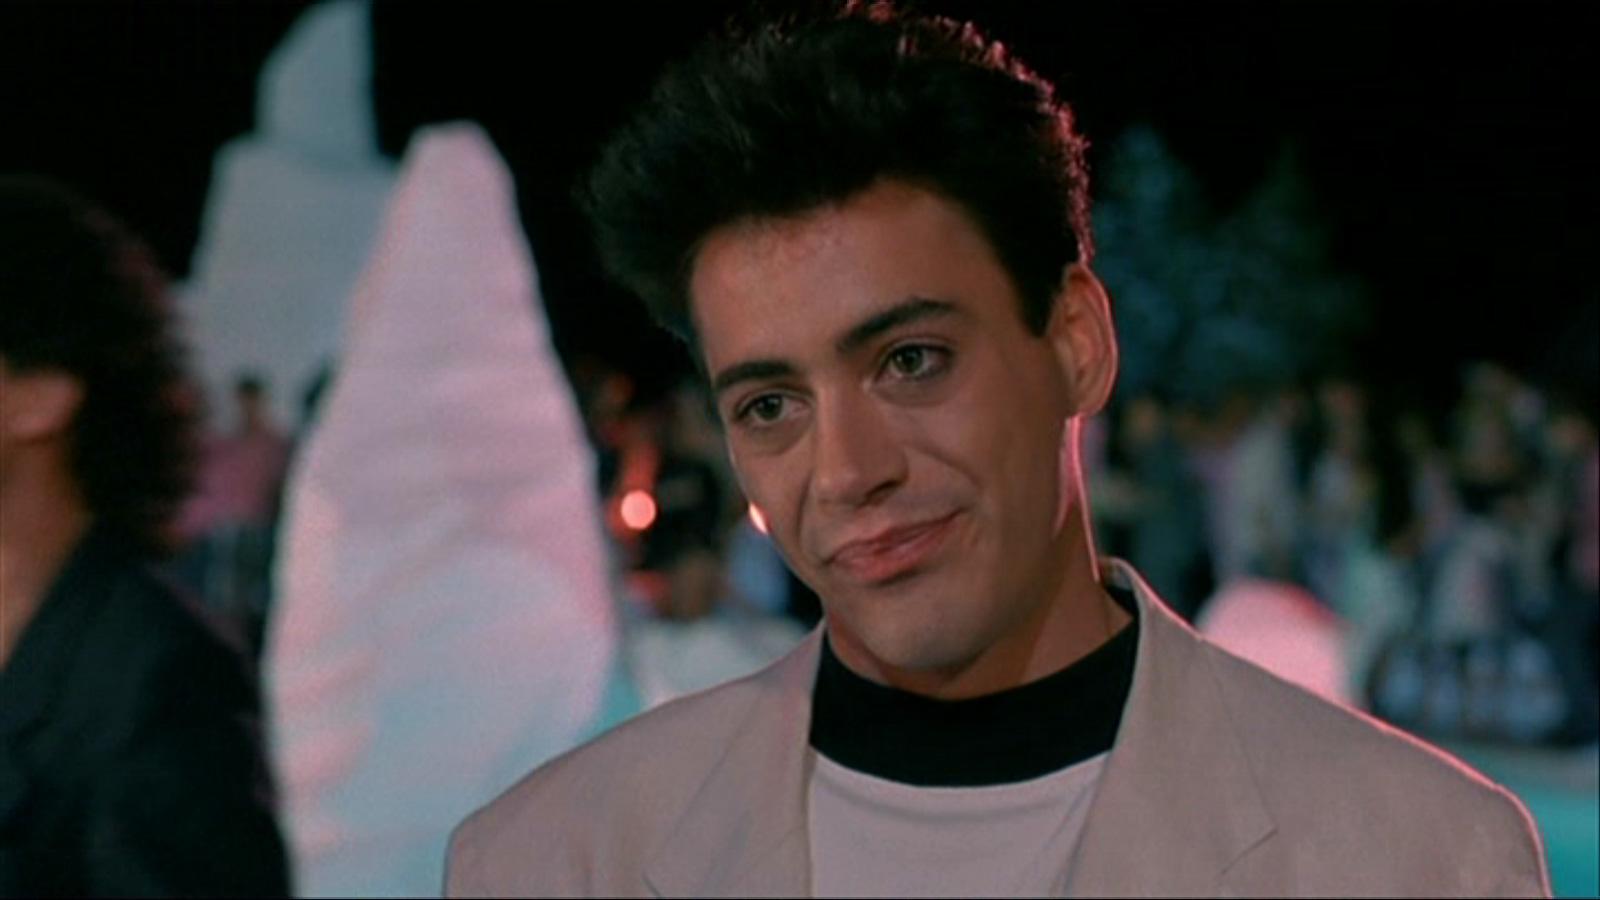 Robert Downey Jr. in Less Than Zero (1987)